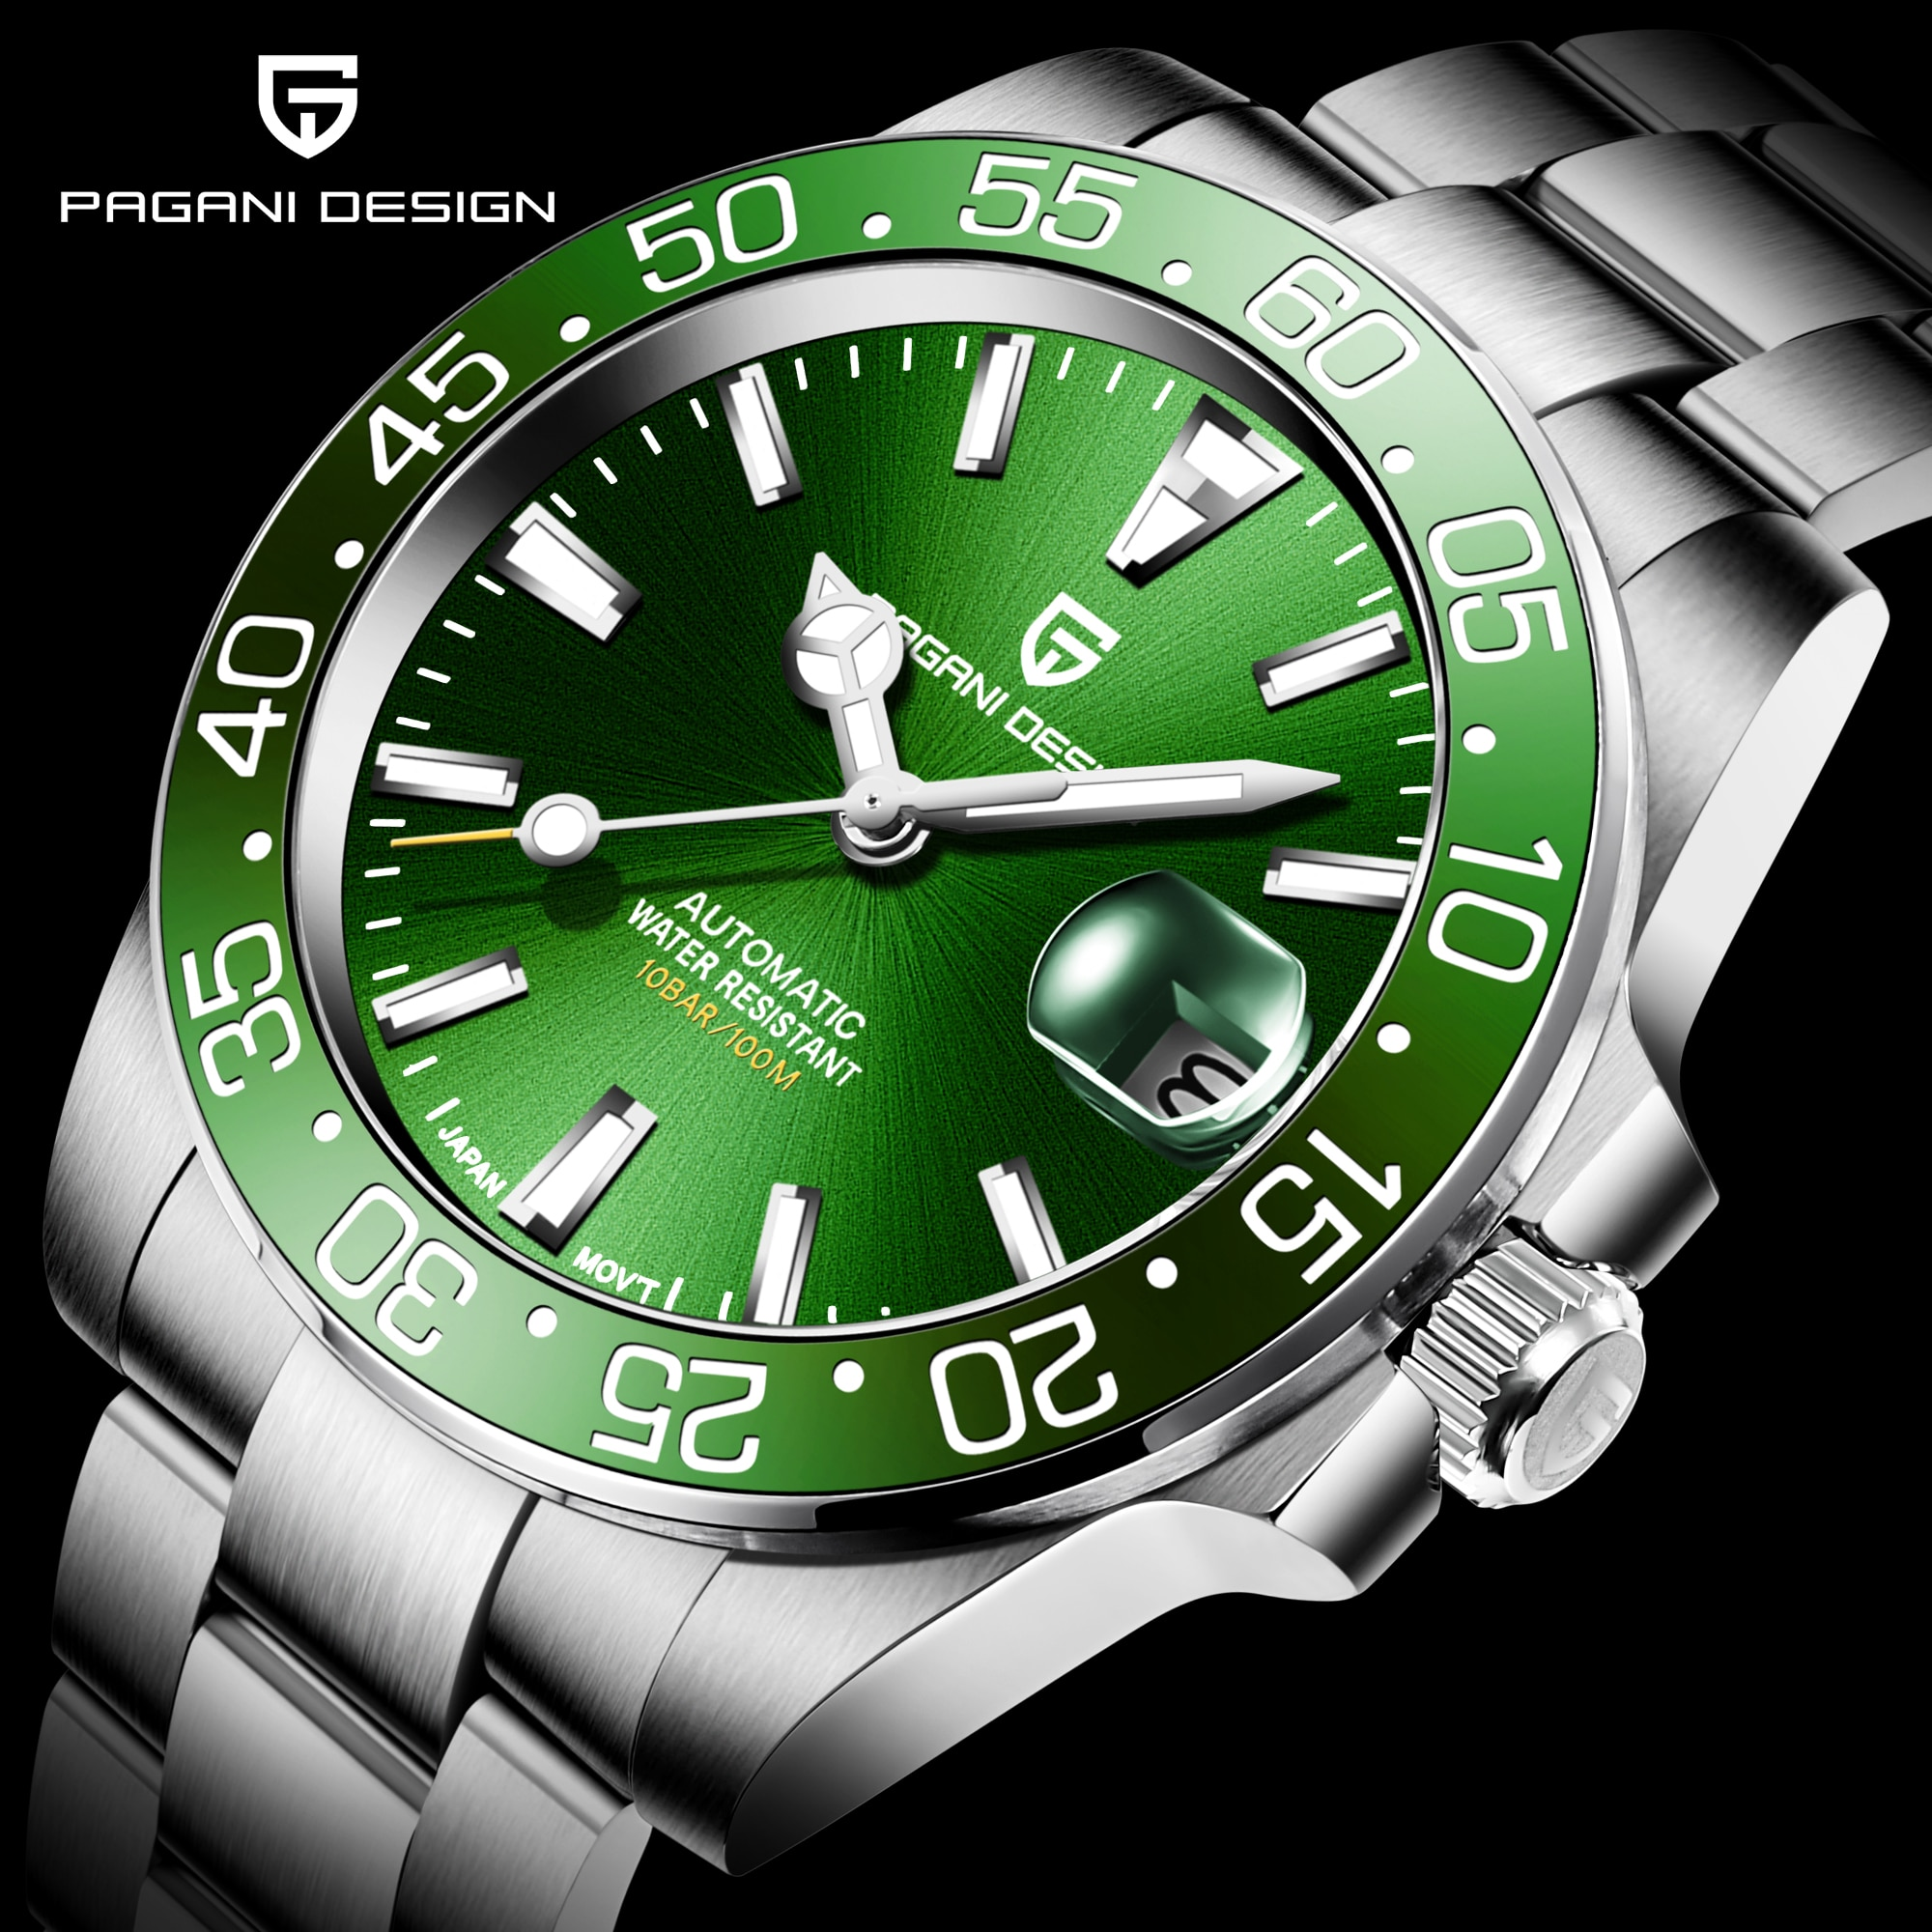 PAGANI DESIGN-ساعة أوتوماتيكية من الياقوت للرجال ، ساعة من الفولاذ المقاوم للصدأ NH35 ، مقاومة للماء حتى 2020 متر ، ميكانيكية ، 100